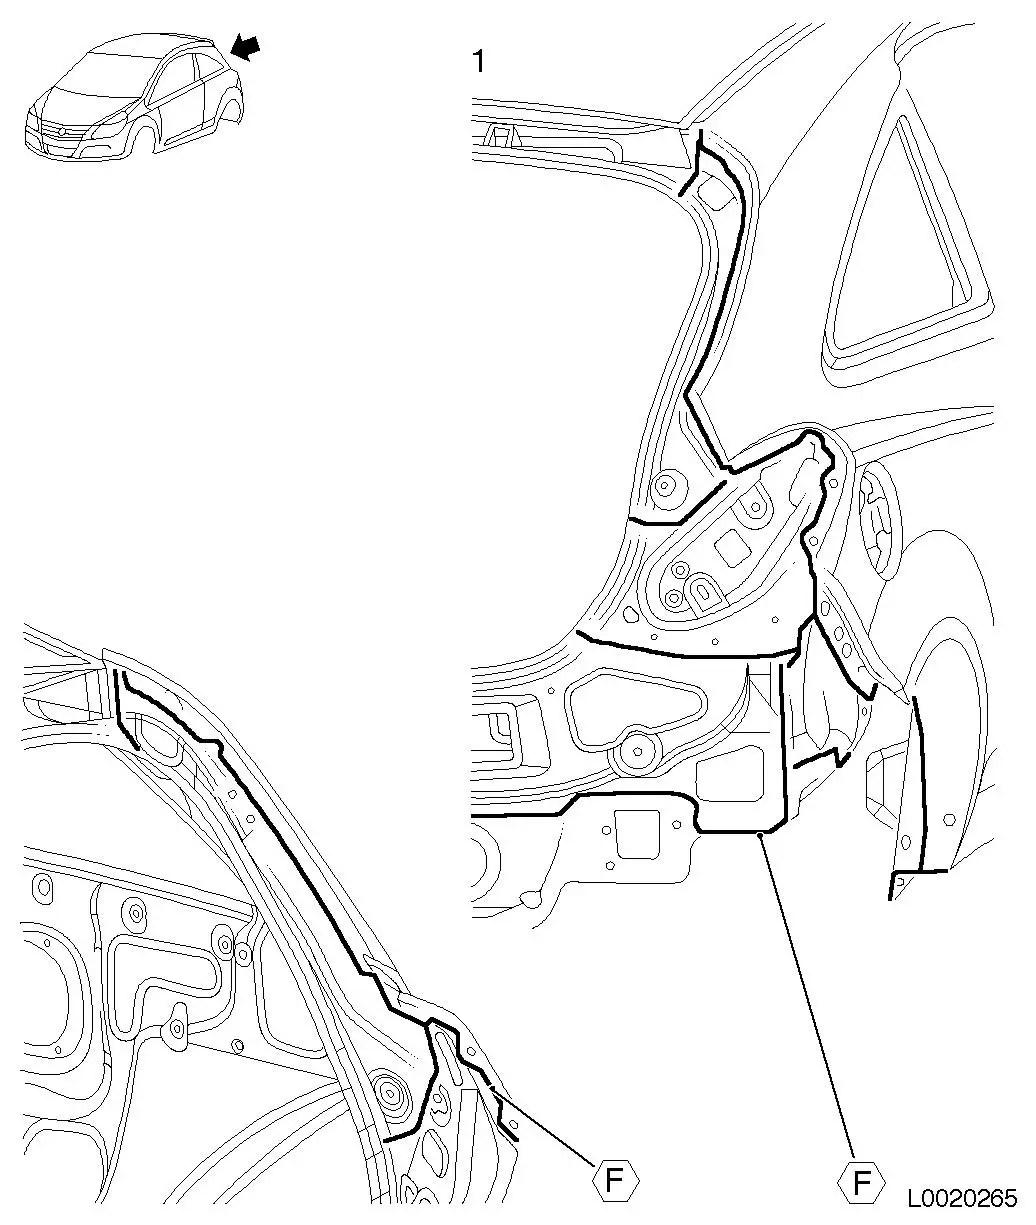 Vauxhall Workshop Manuals > Corsa D > B Paint > Corrosion